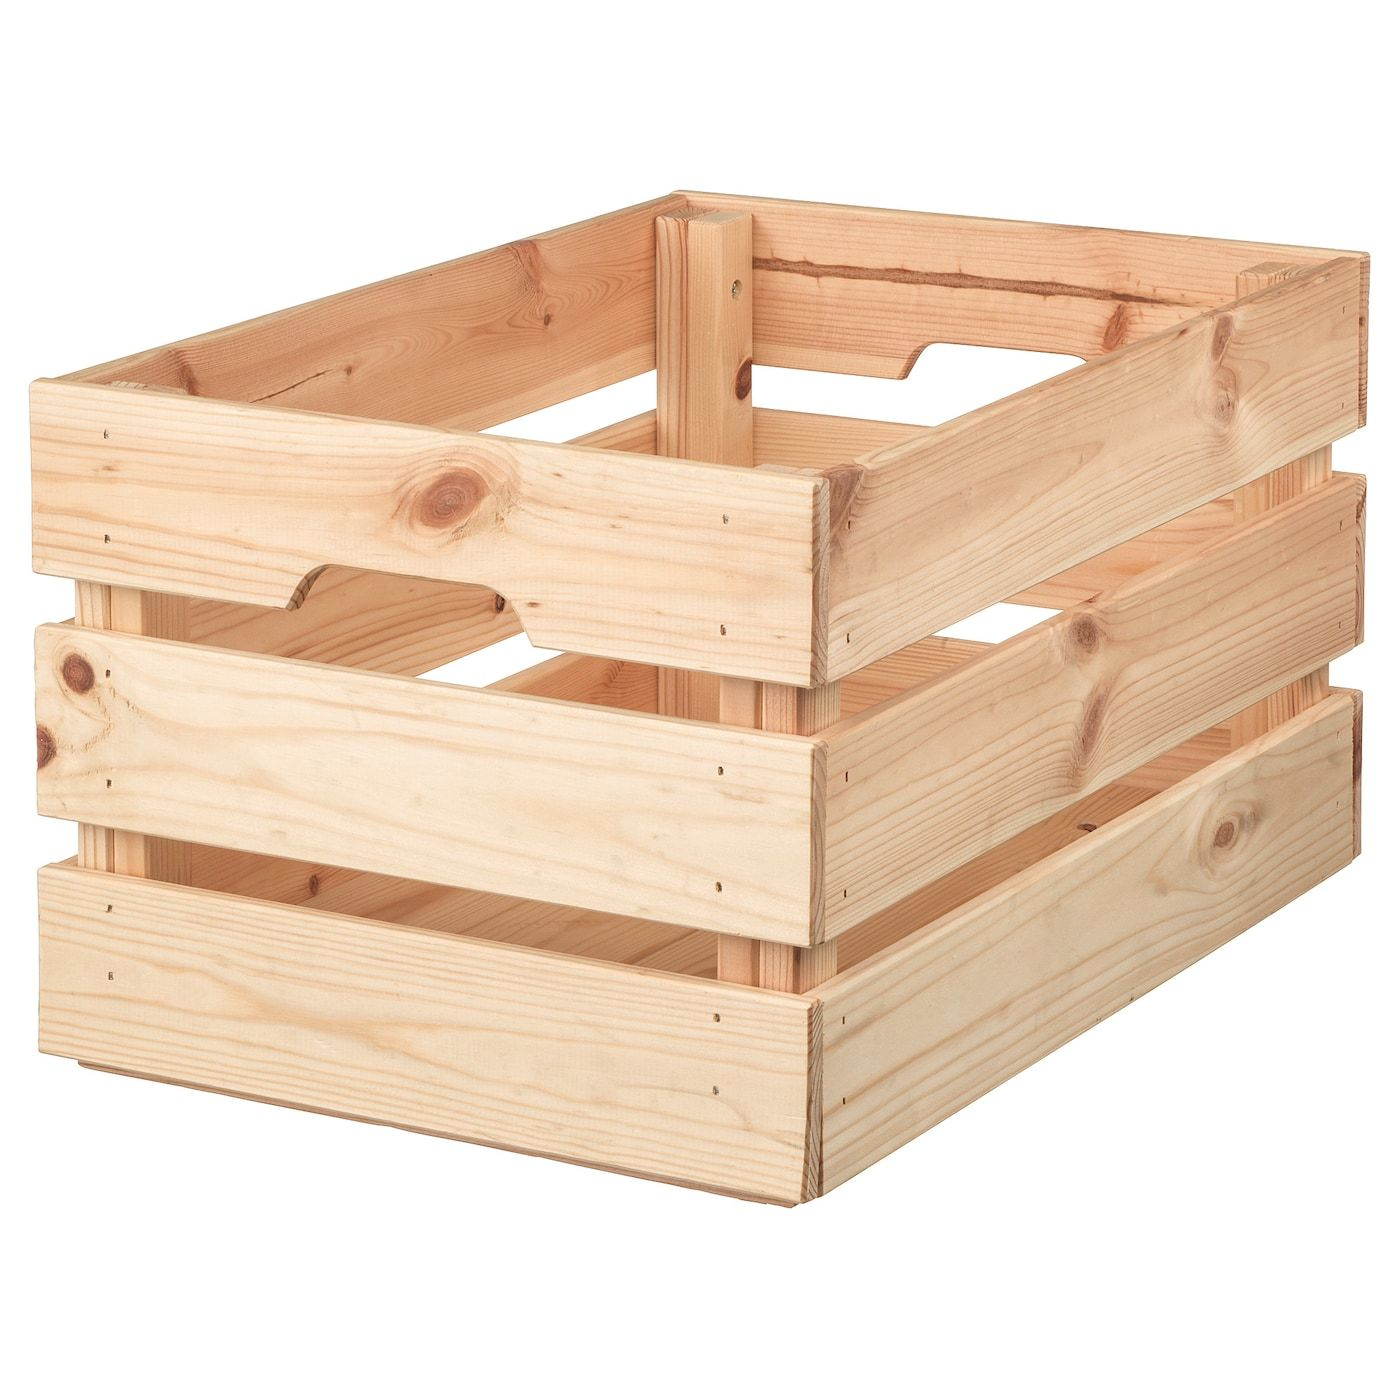 Knagglig Skatuľa Borovica 46x31x25 Cm Ikea In 2020 Ikea Wood Crates Small Storage